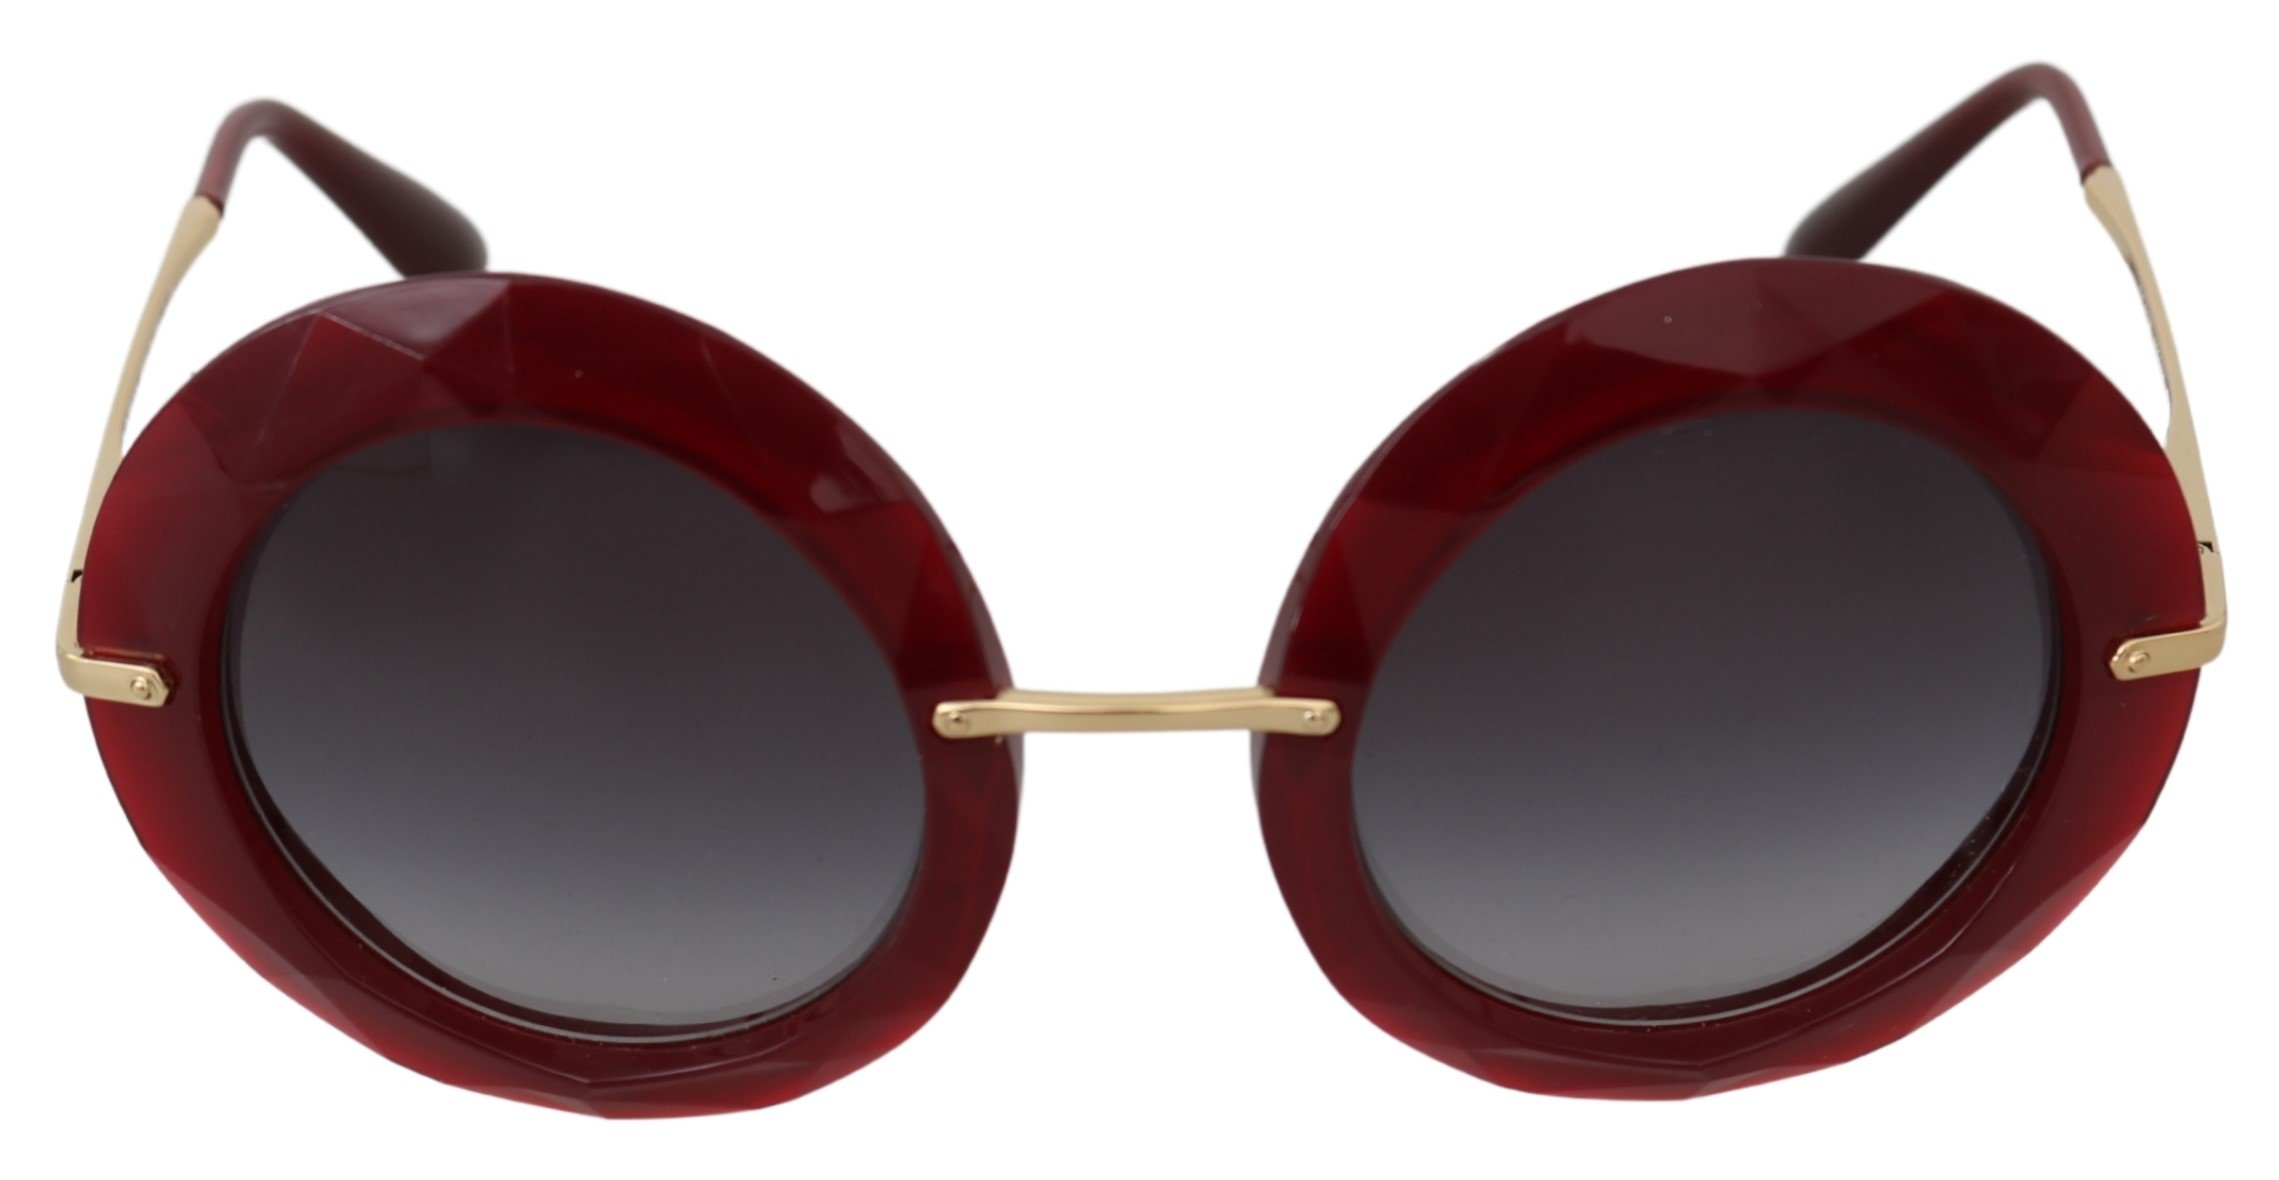 Dolce & Gabbana Women's Round Gradient Logo Sunglasses Gold GLA756